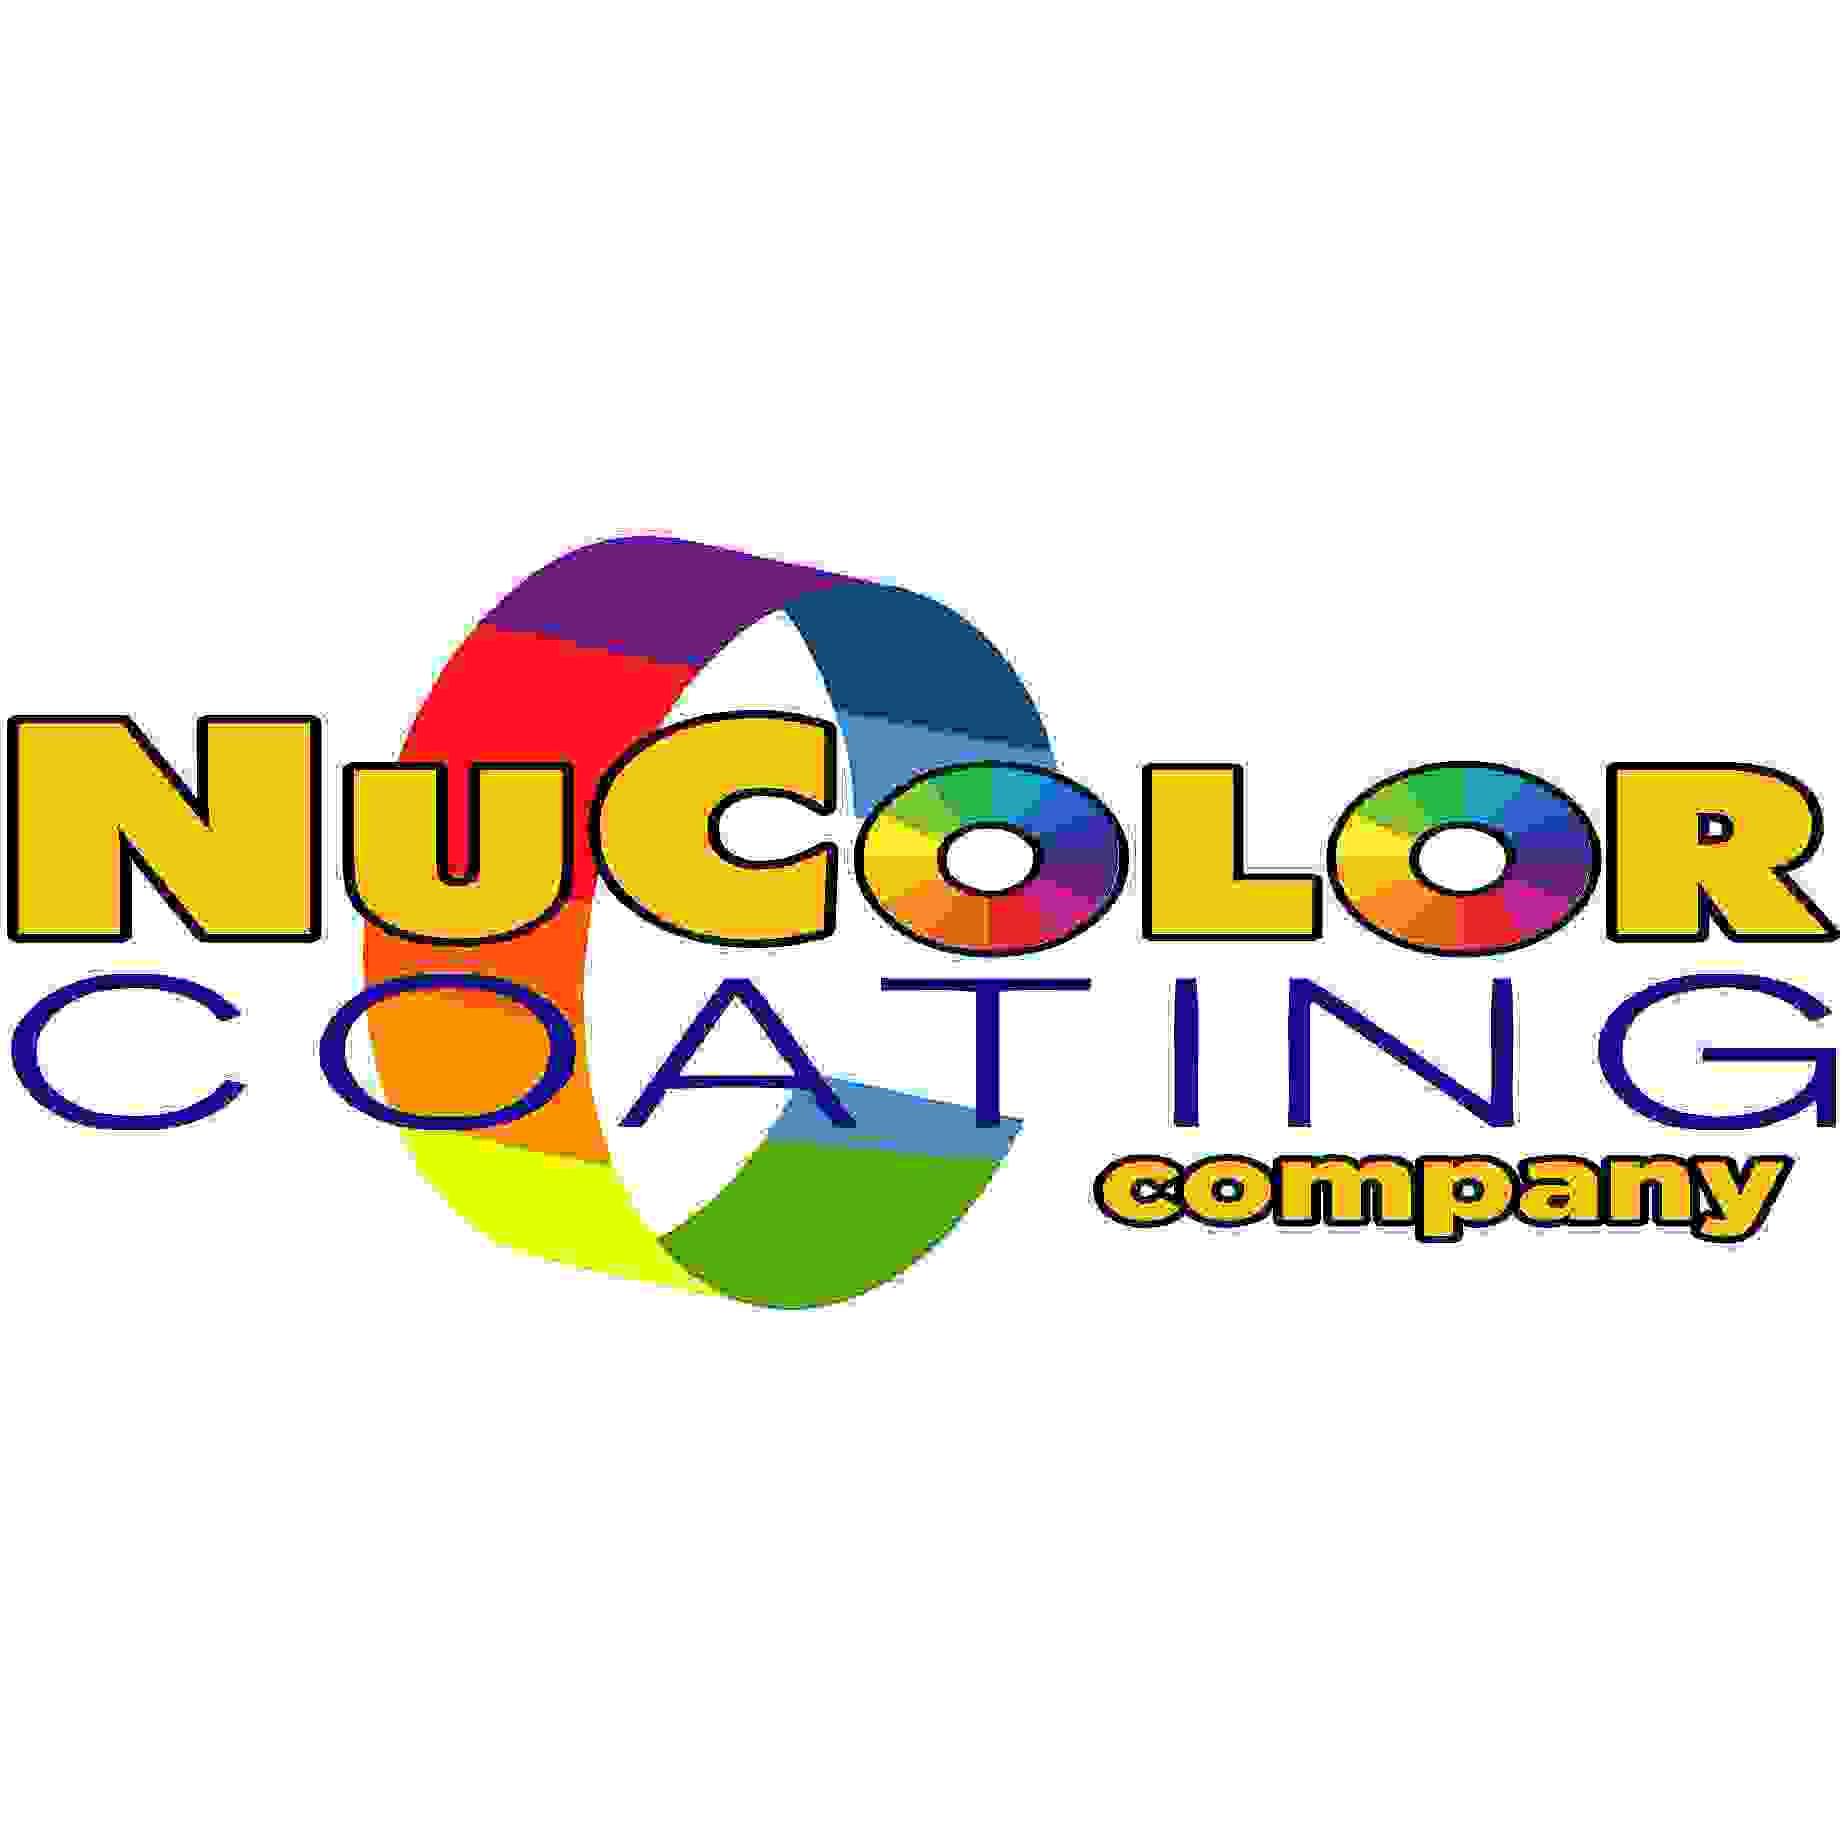 NuColor Coating Company